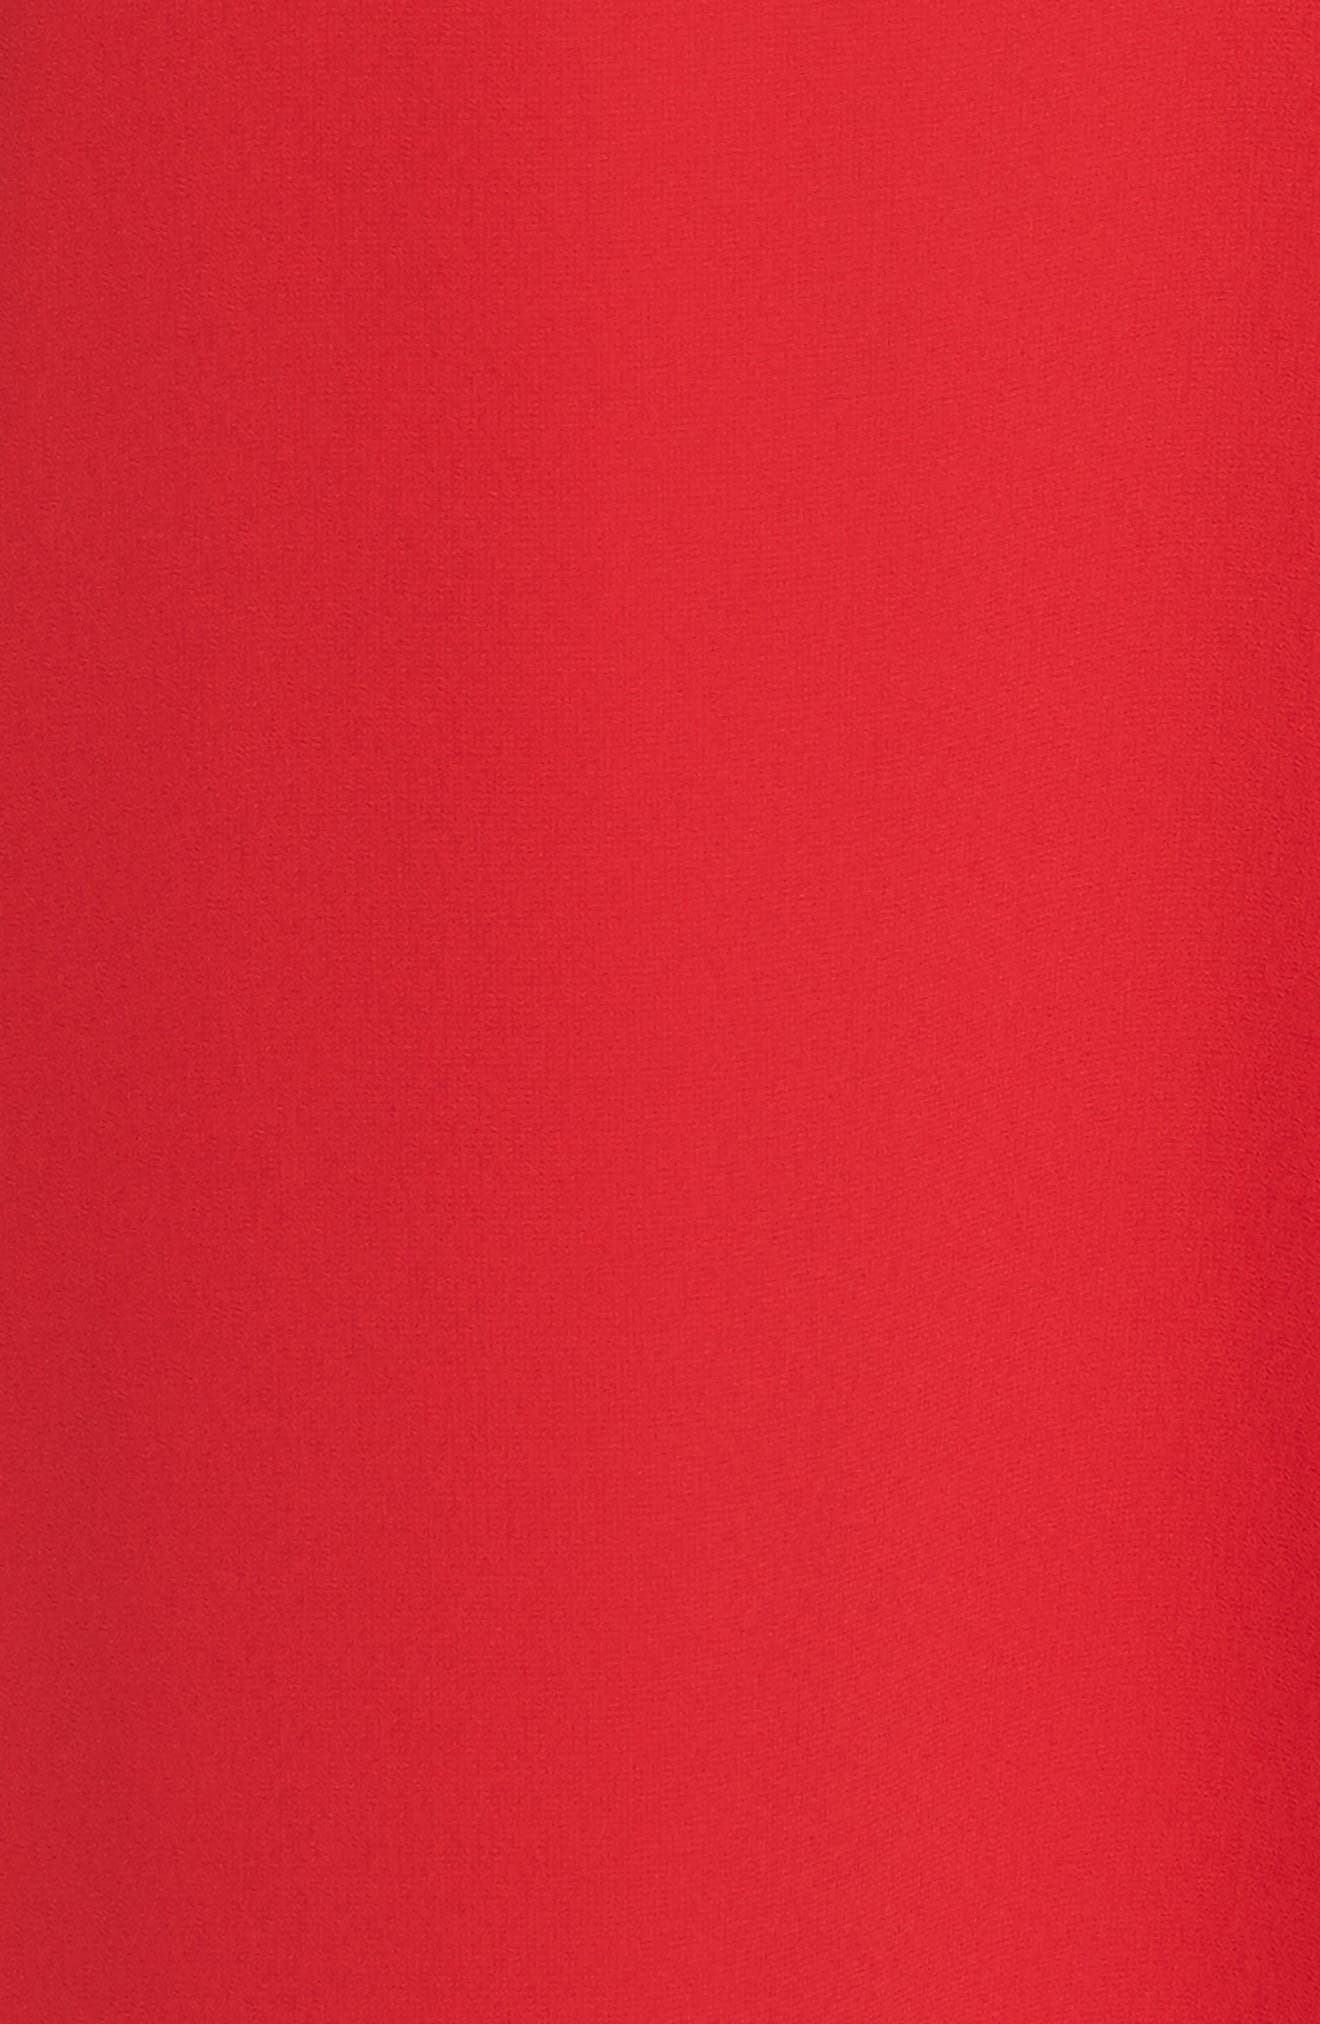 Souffle Chiffon Shift Dress,                             Alternate thumbnail 5, color,                             Crimson